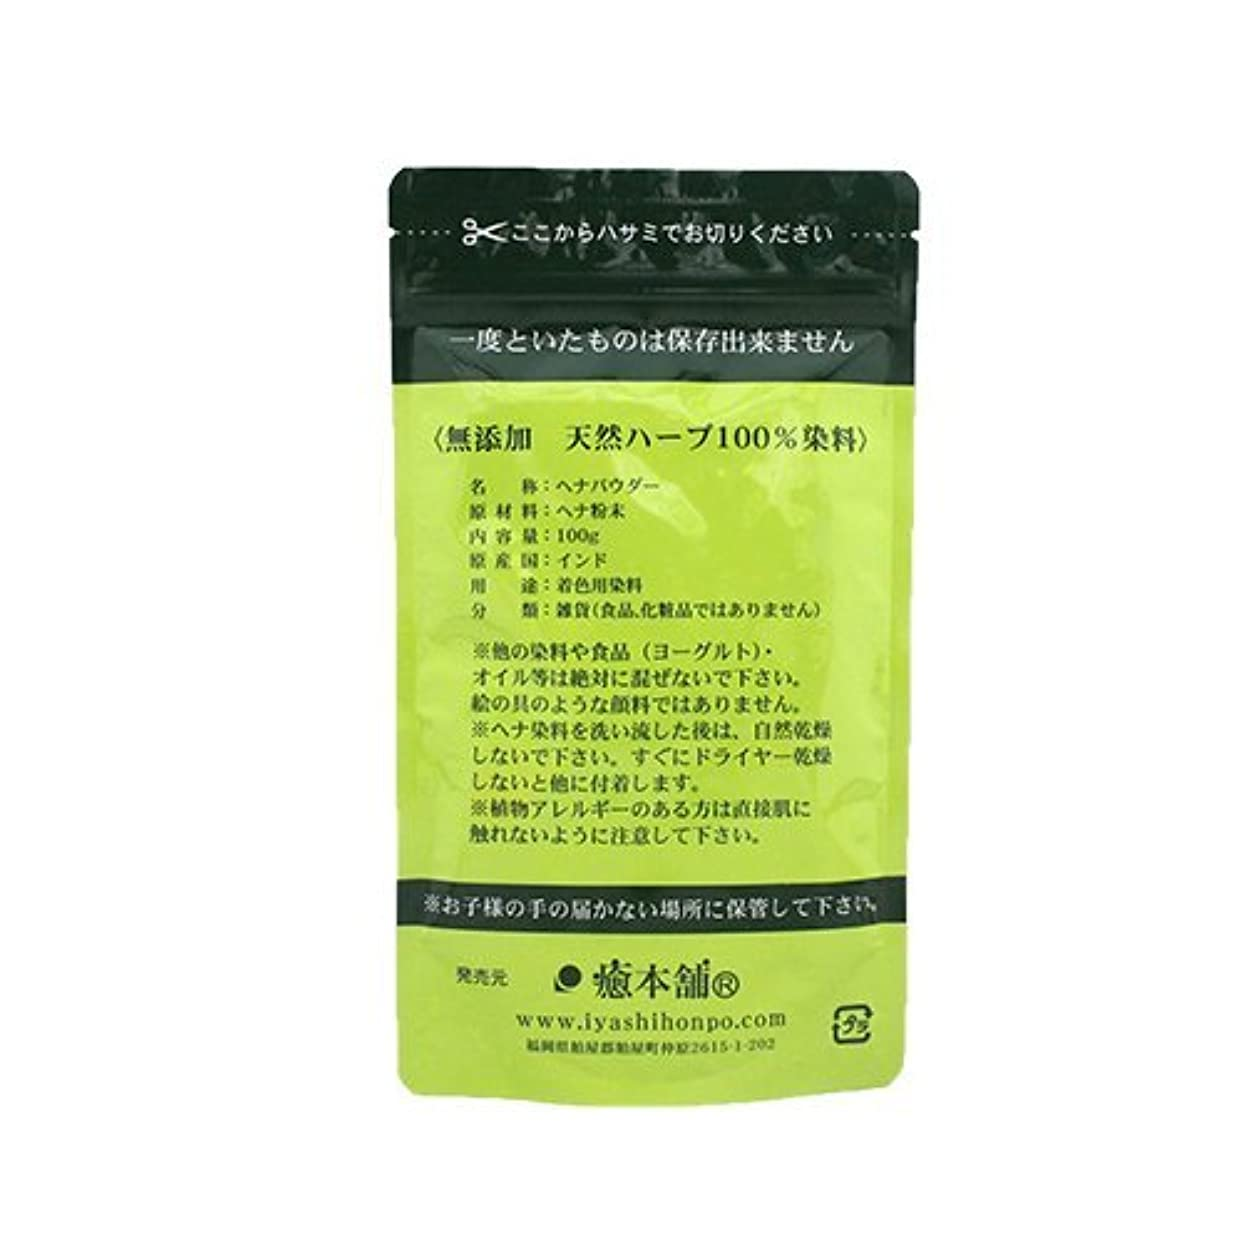 実験的展望台集団的癒本舗 ヘナ(天然染料100%) 100g